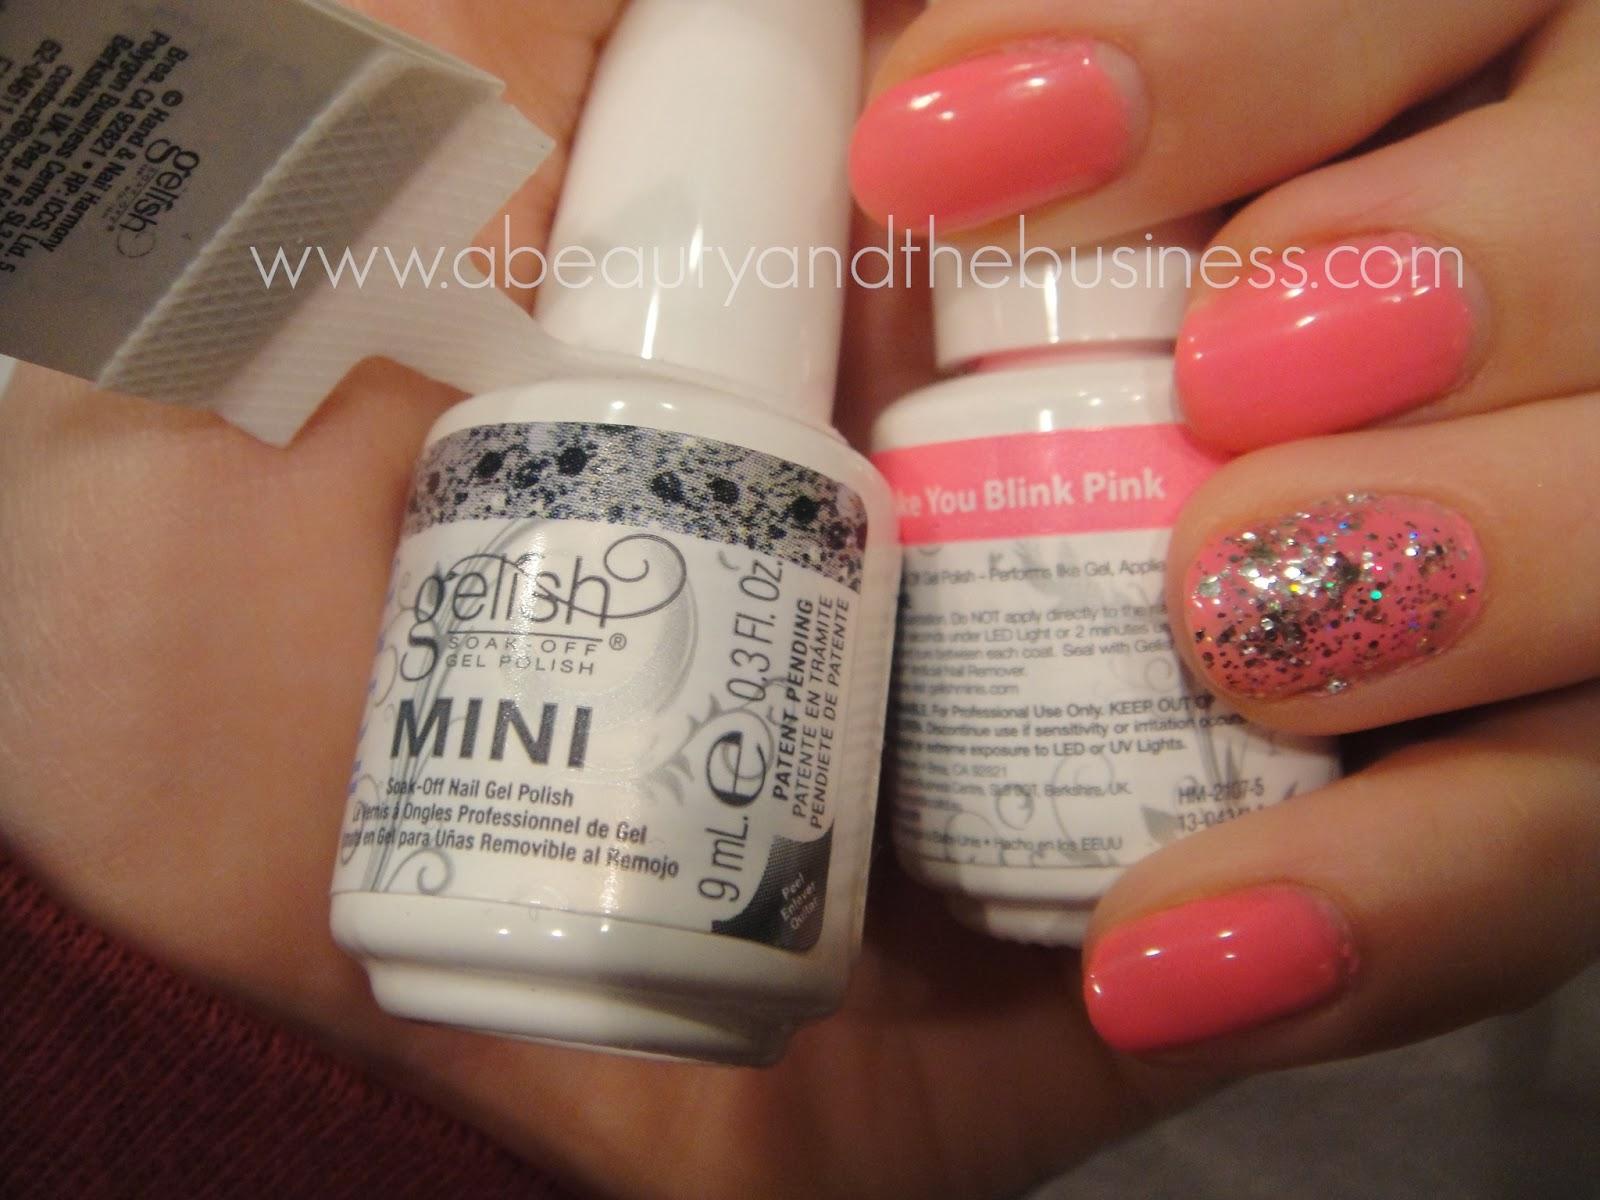 gelish, gelish trends, gelish make you blink pink, gelish make you blink pink swatch, gelish trends, gleish trends am i making you gelish, neon pink gel polish